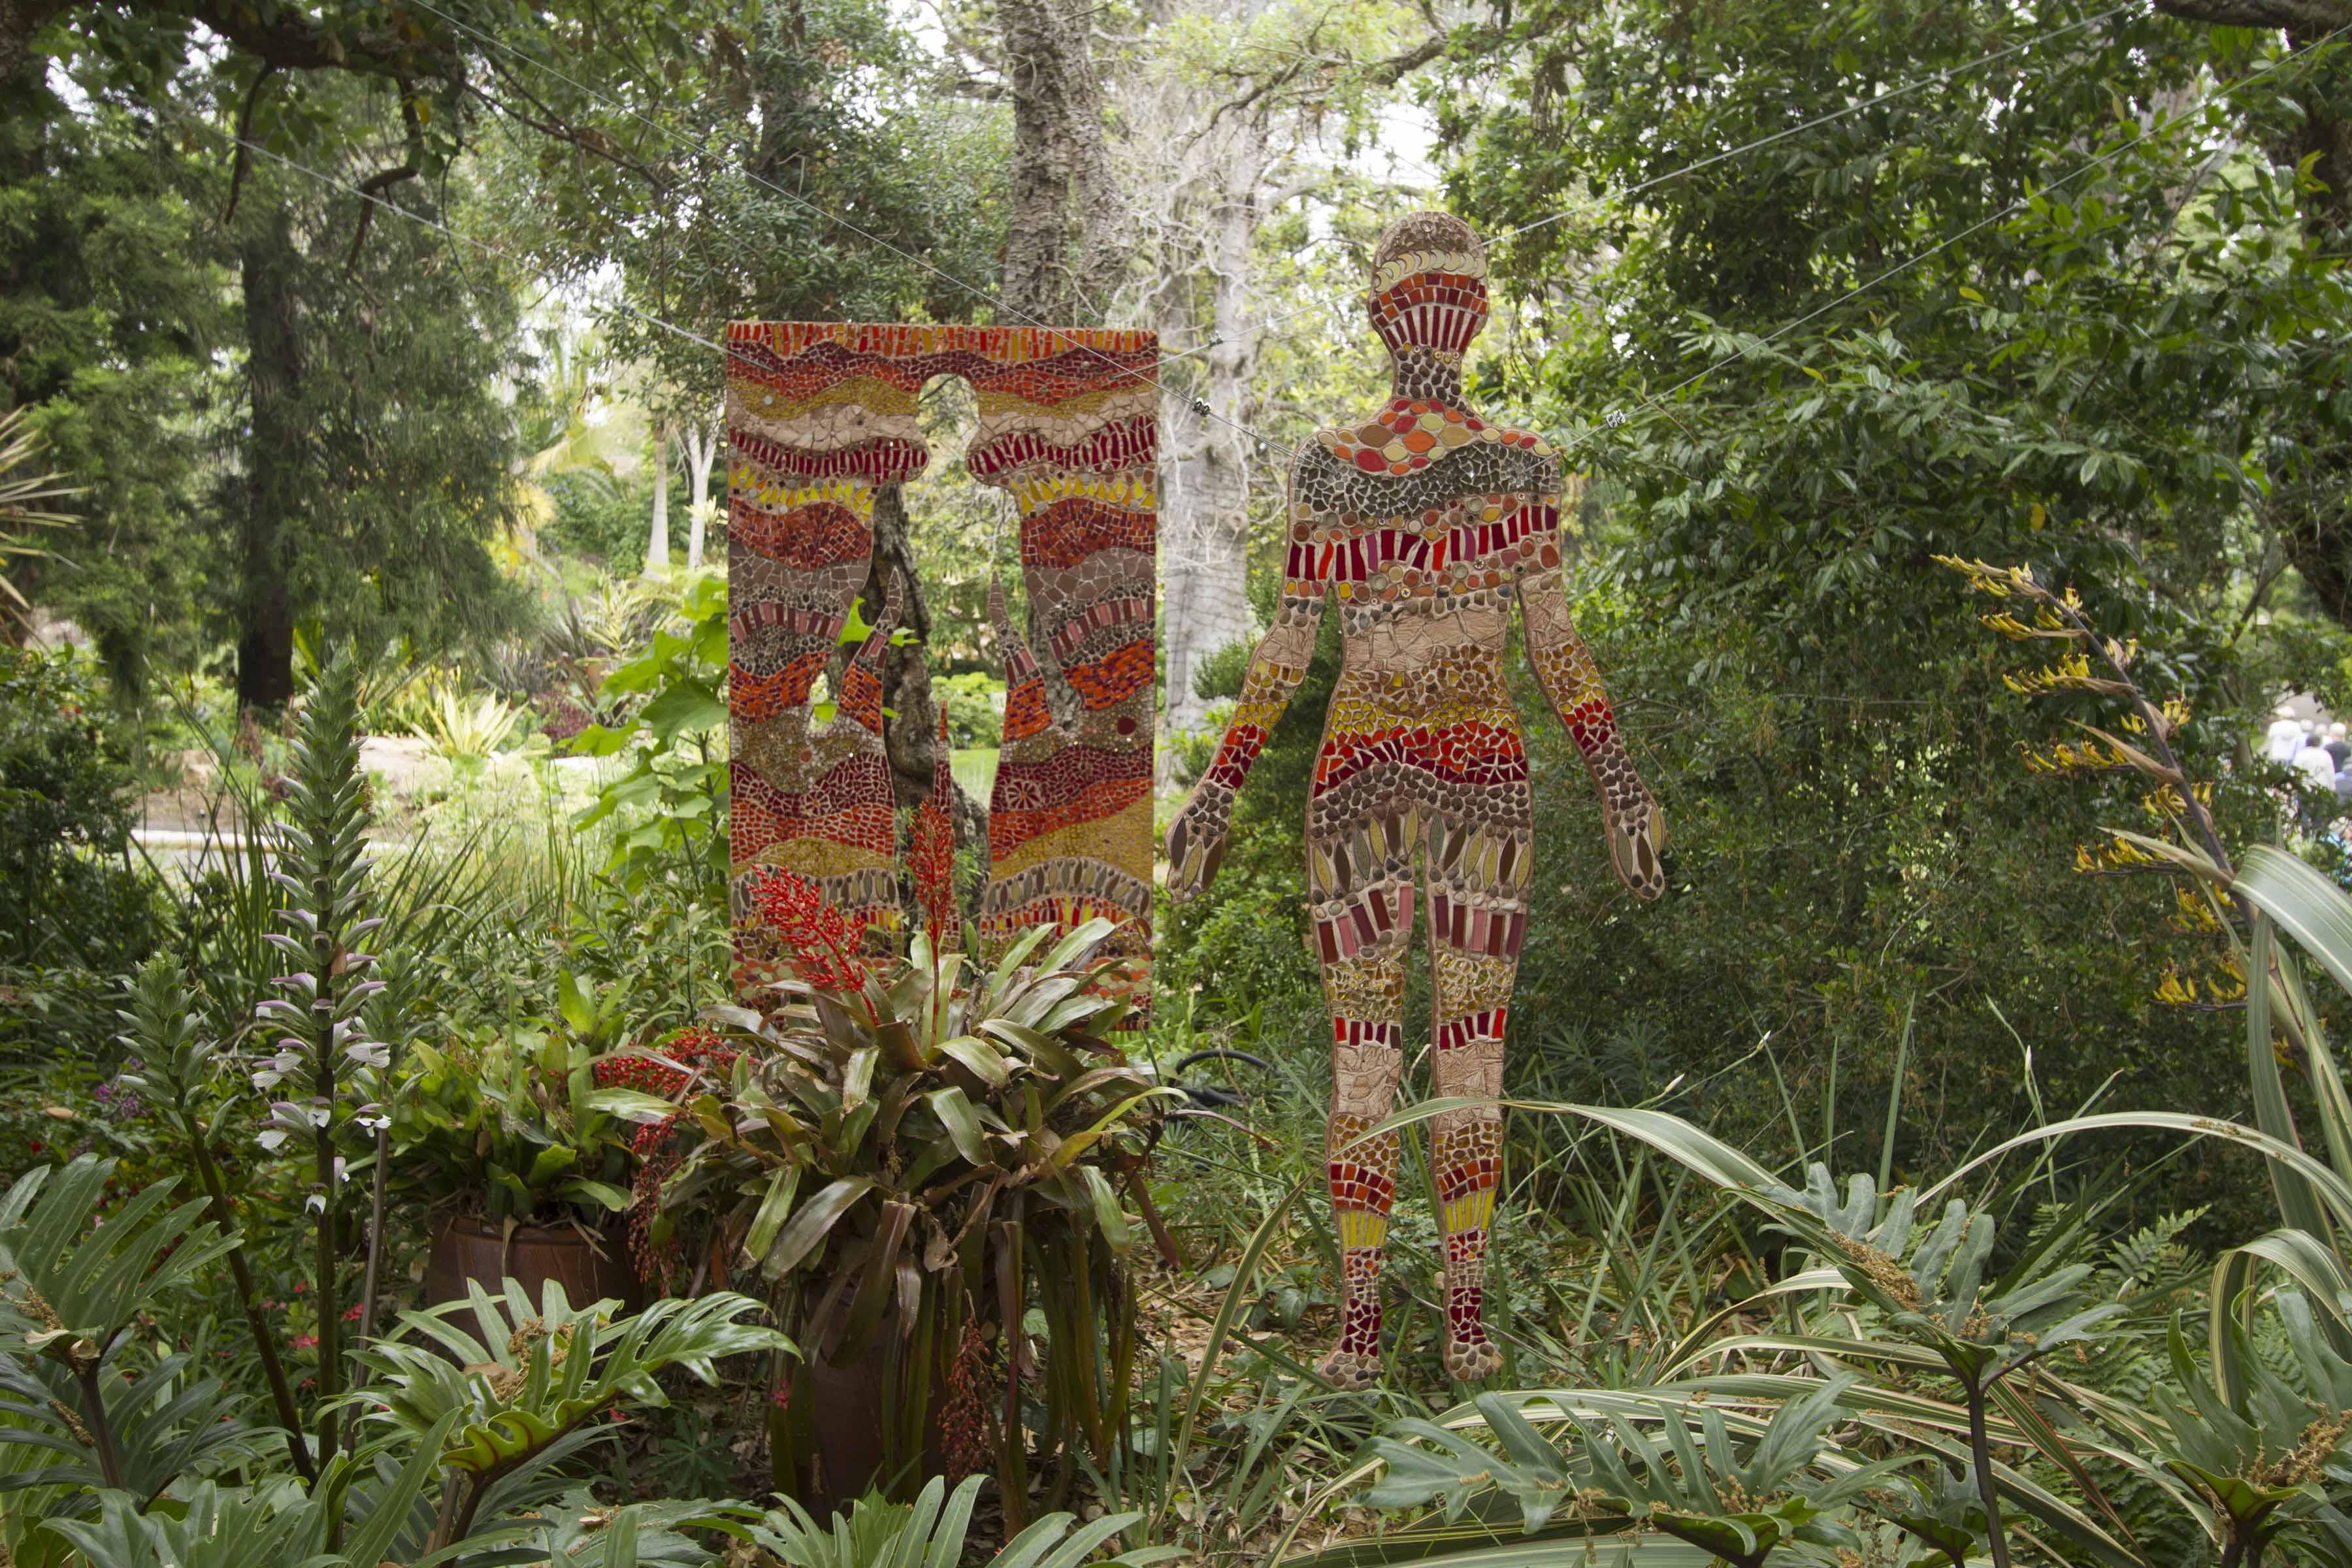 Whimsical sculptures return to San Diego Botanic Garden | Carlsbad ...